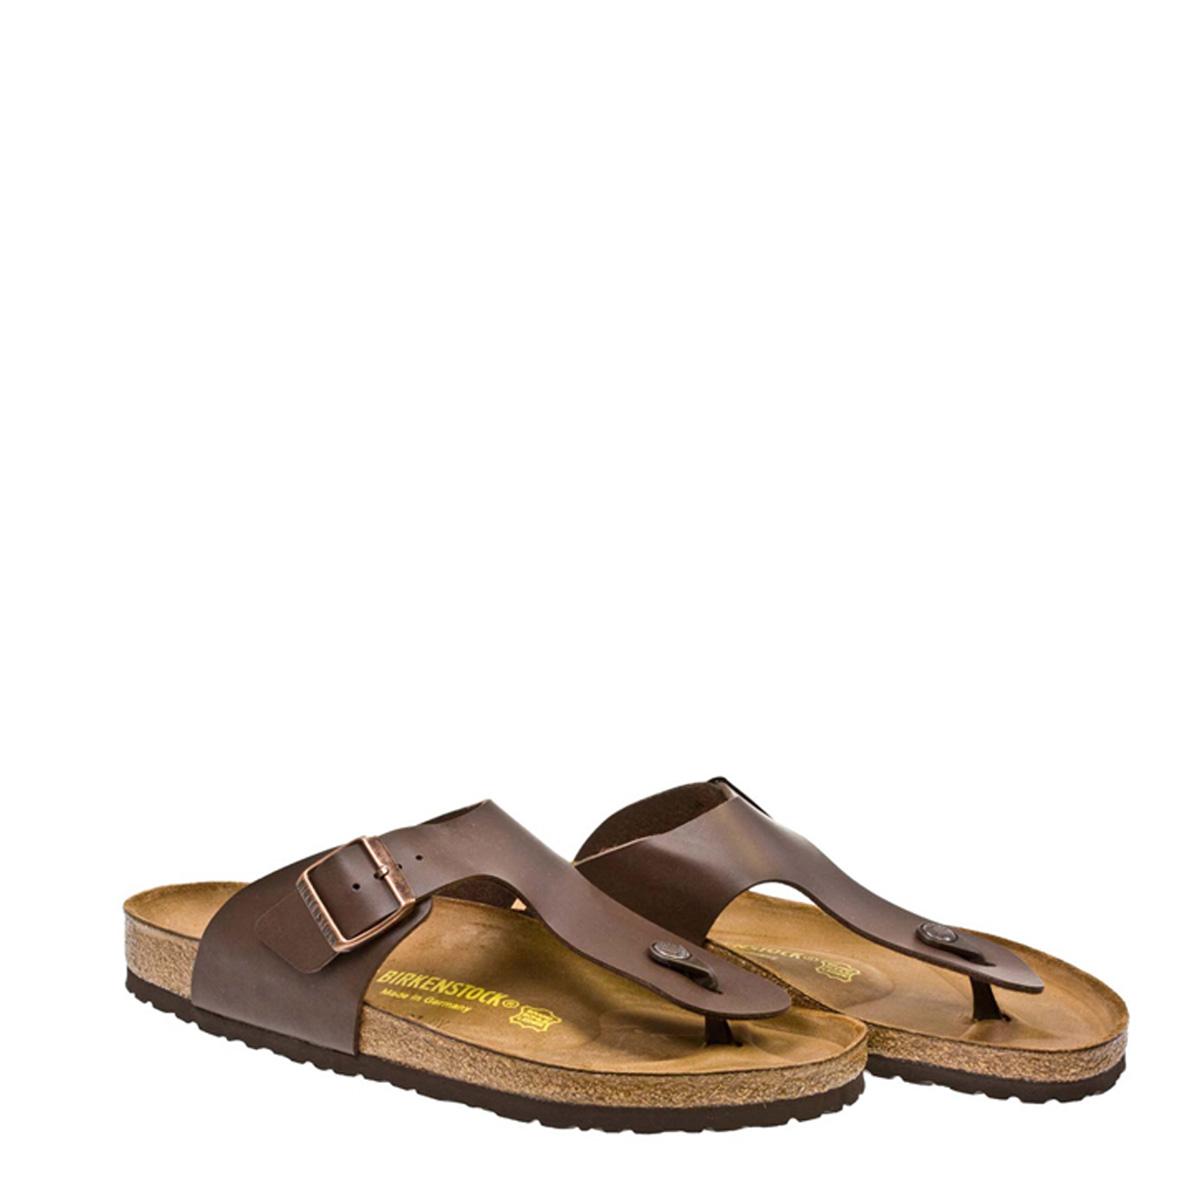 9aac9ff70f1a Details about Birkenstock Ramses Birko-Flor Mens Brown Leather Sandals Toe  Post Summer Shoes